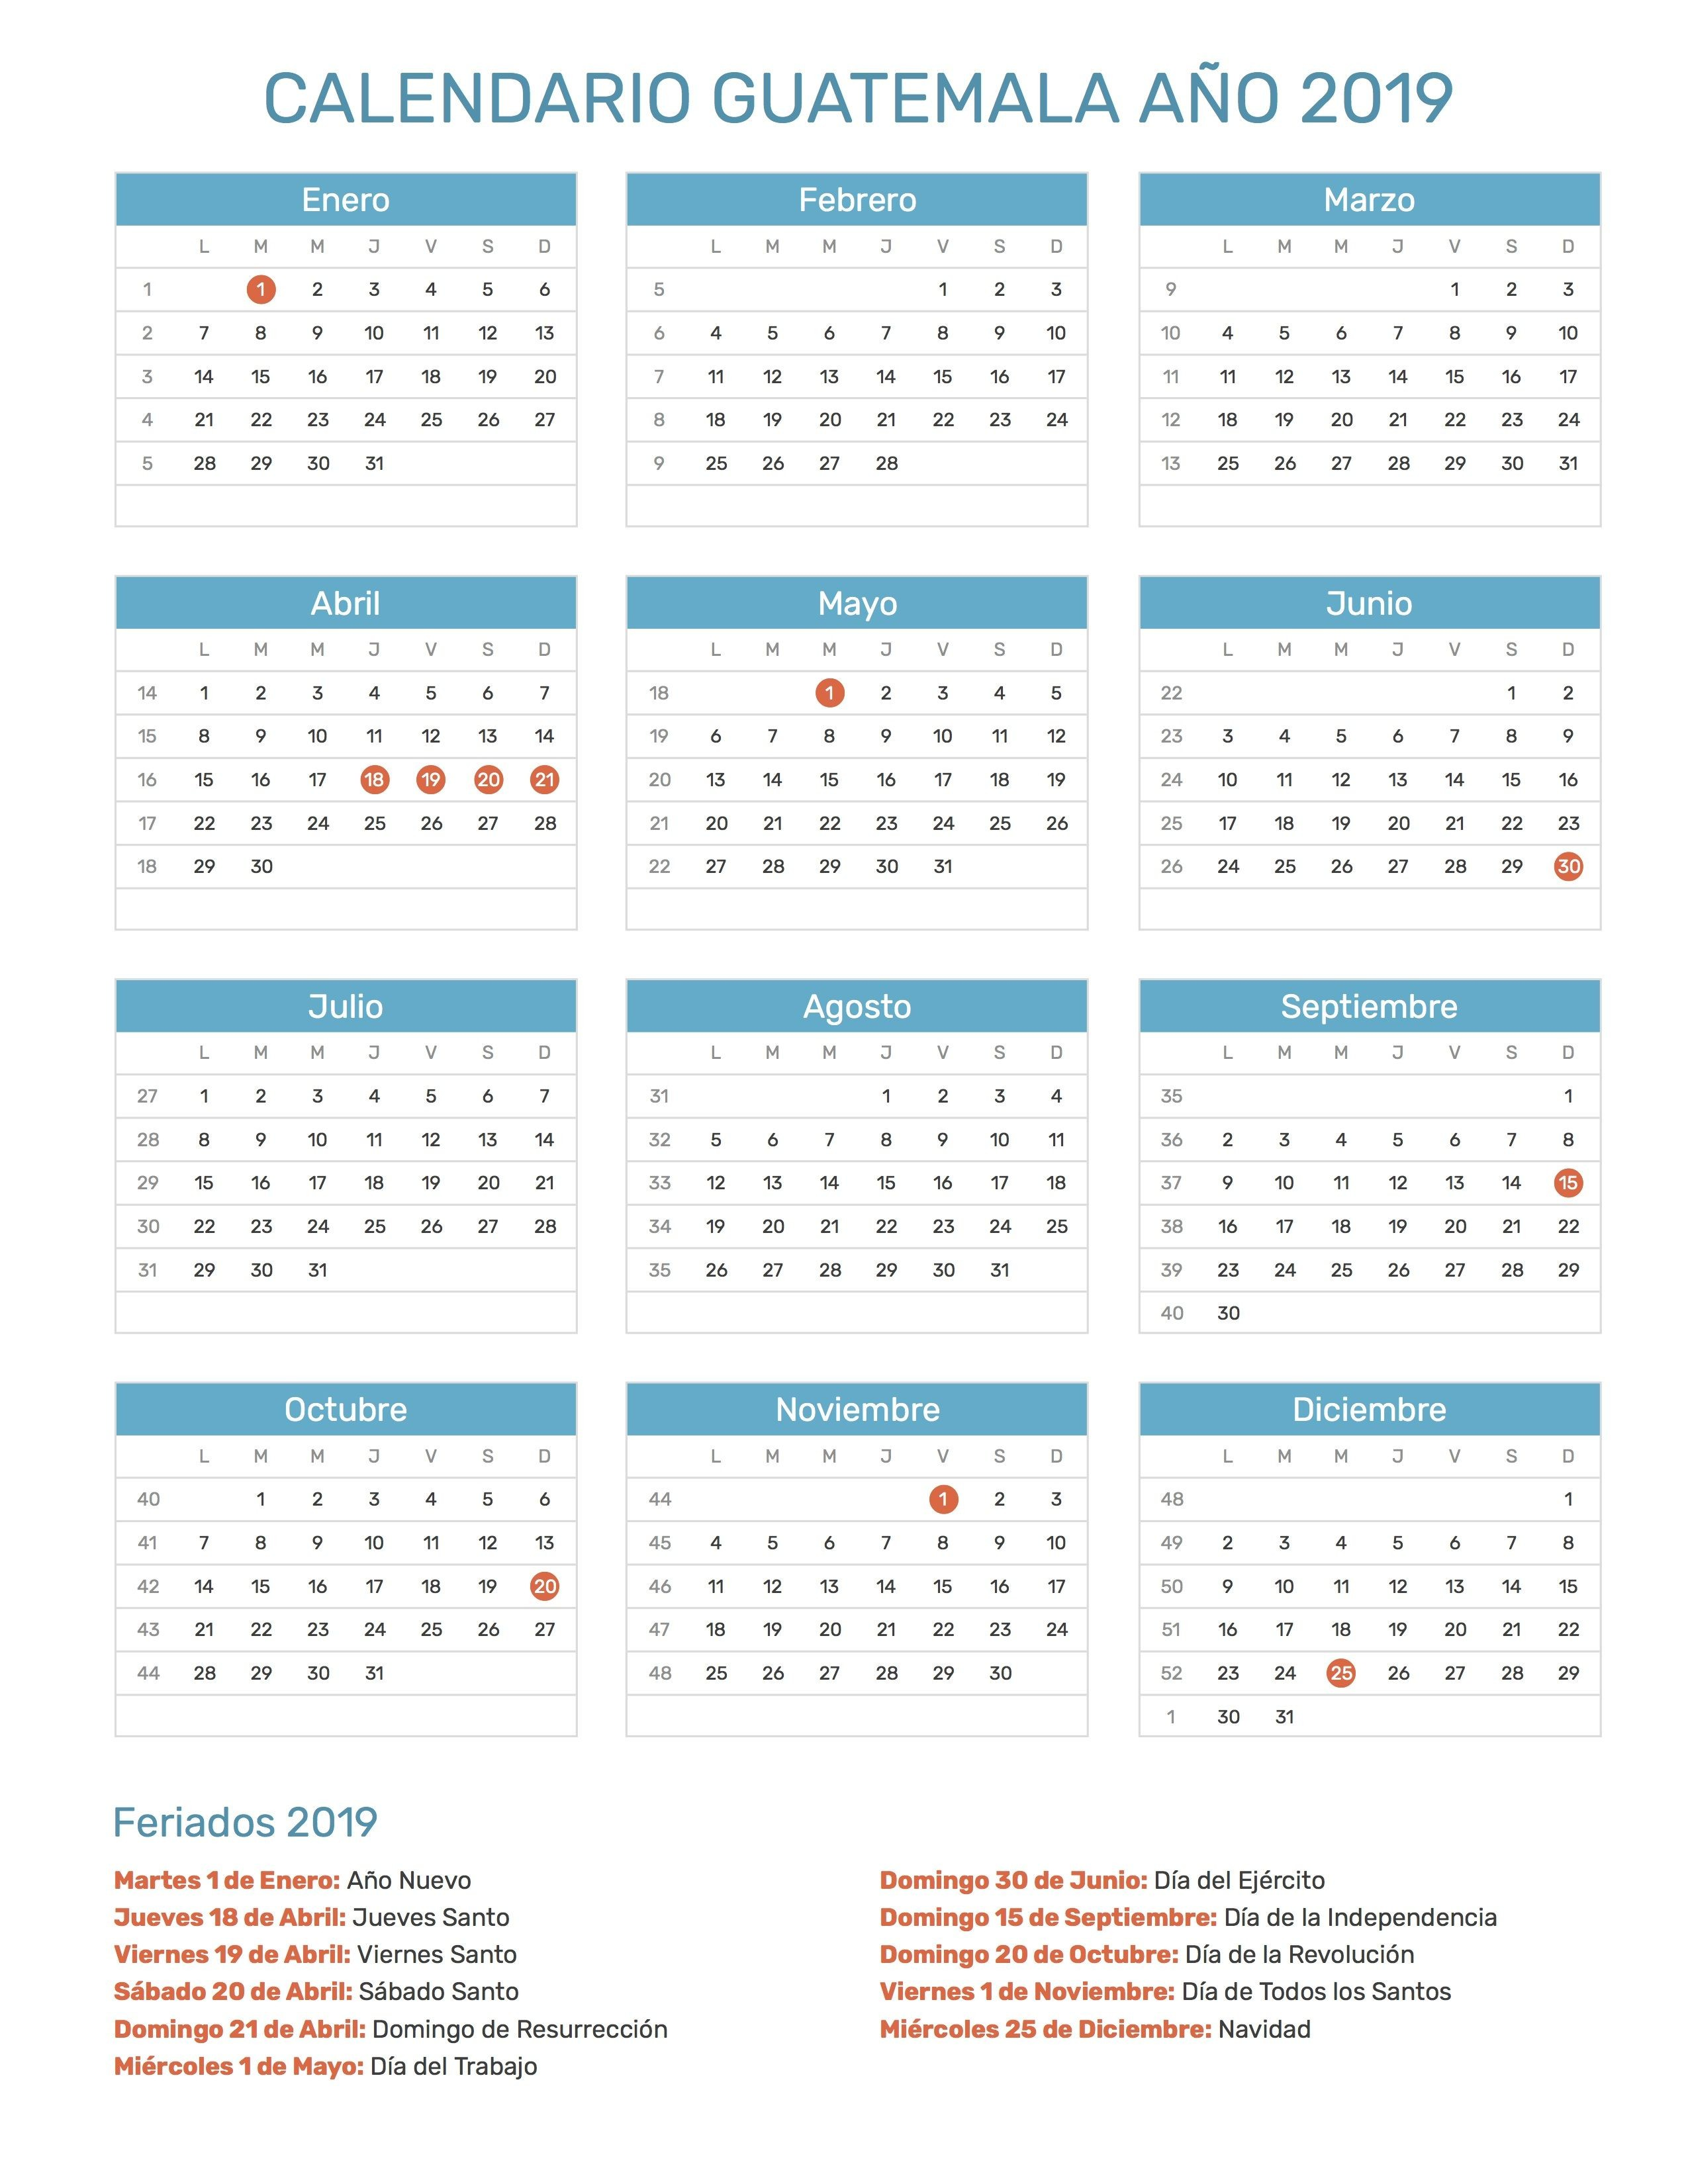 Calendario 2019 Chile Imprimir Con Feriados Más Populares Pin De Calendario Hispano En Calendario Con Feriados A±o 2019 Of Calendario 2019 Chile Imprimir Con Feriados Más Recientemente Liberado Calendario 10 Octubre ☼ Calendario 2016 ☺